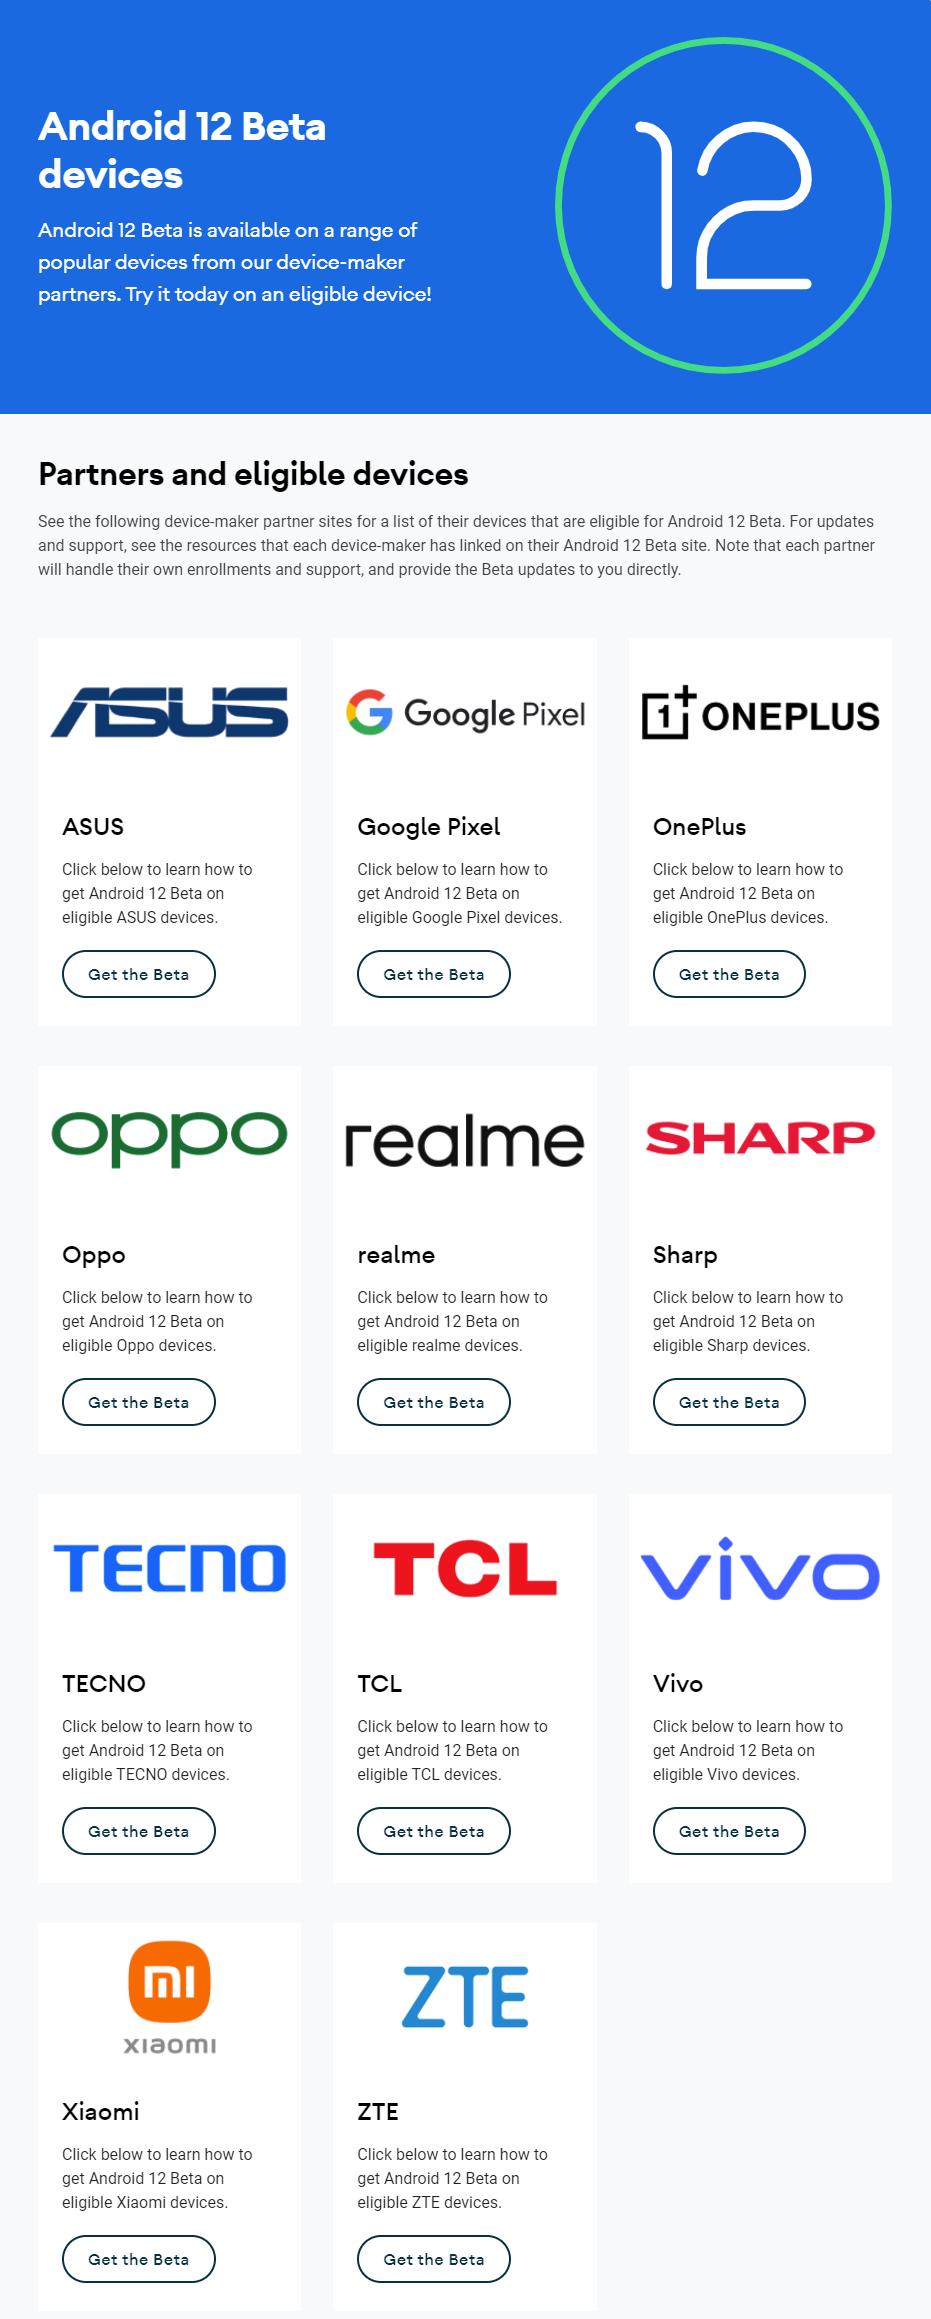 安卓Android 12对比MIUI12.5、ColorOS,谷歌新系统能否狙击鸿蒙